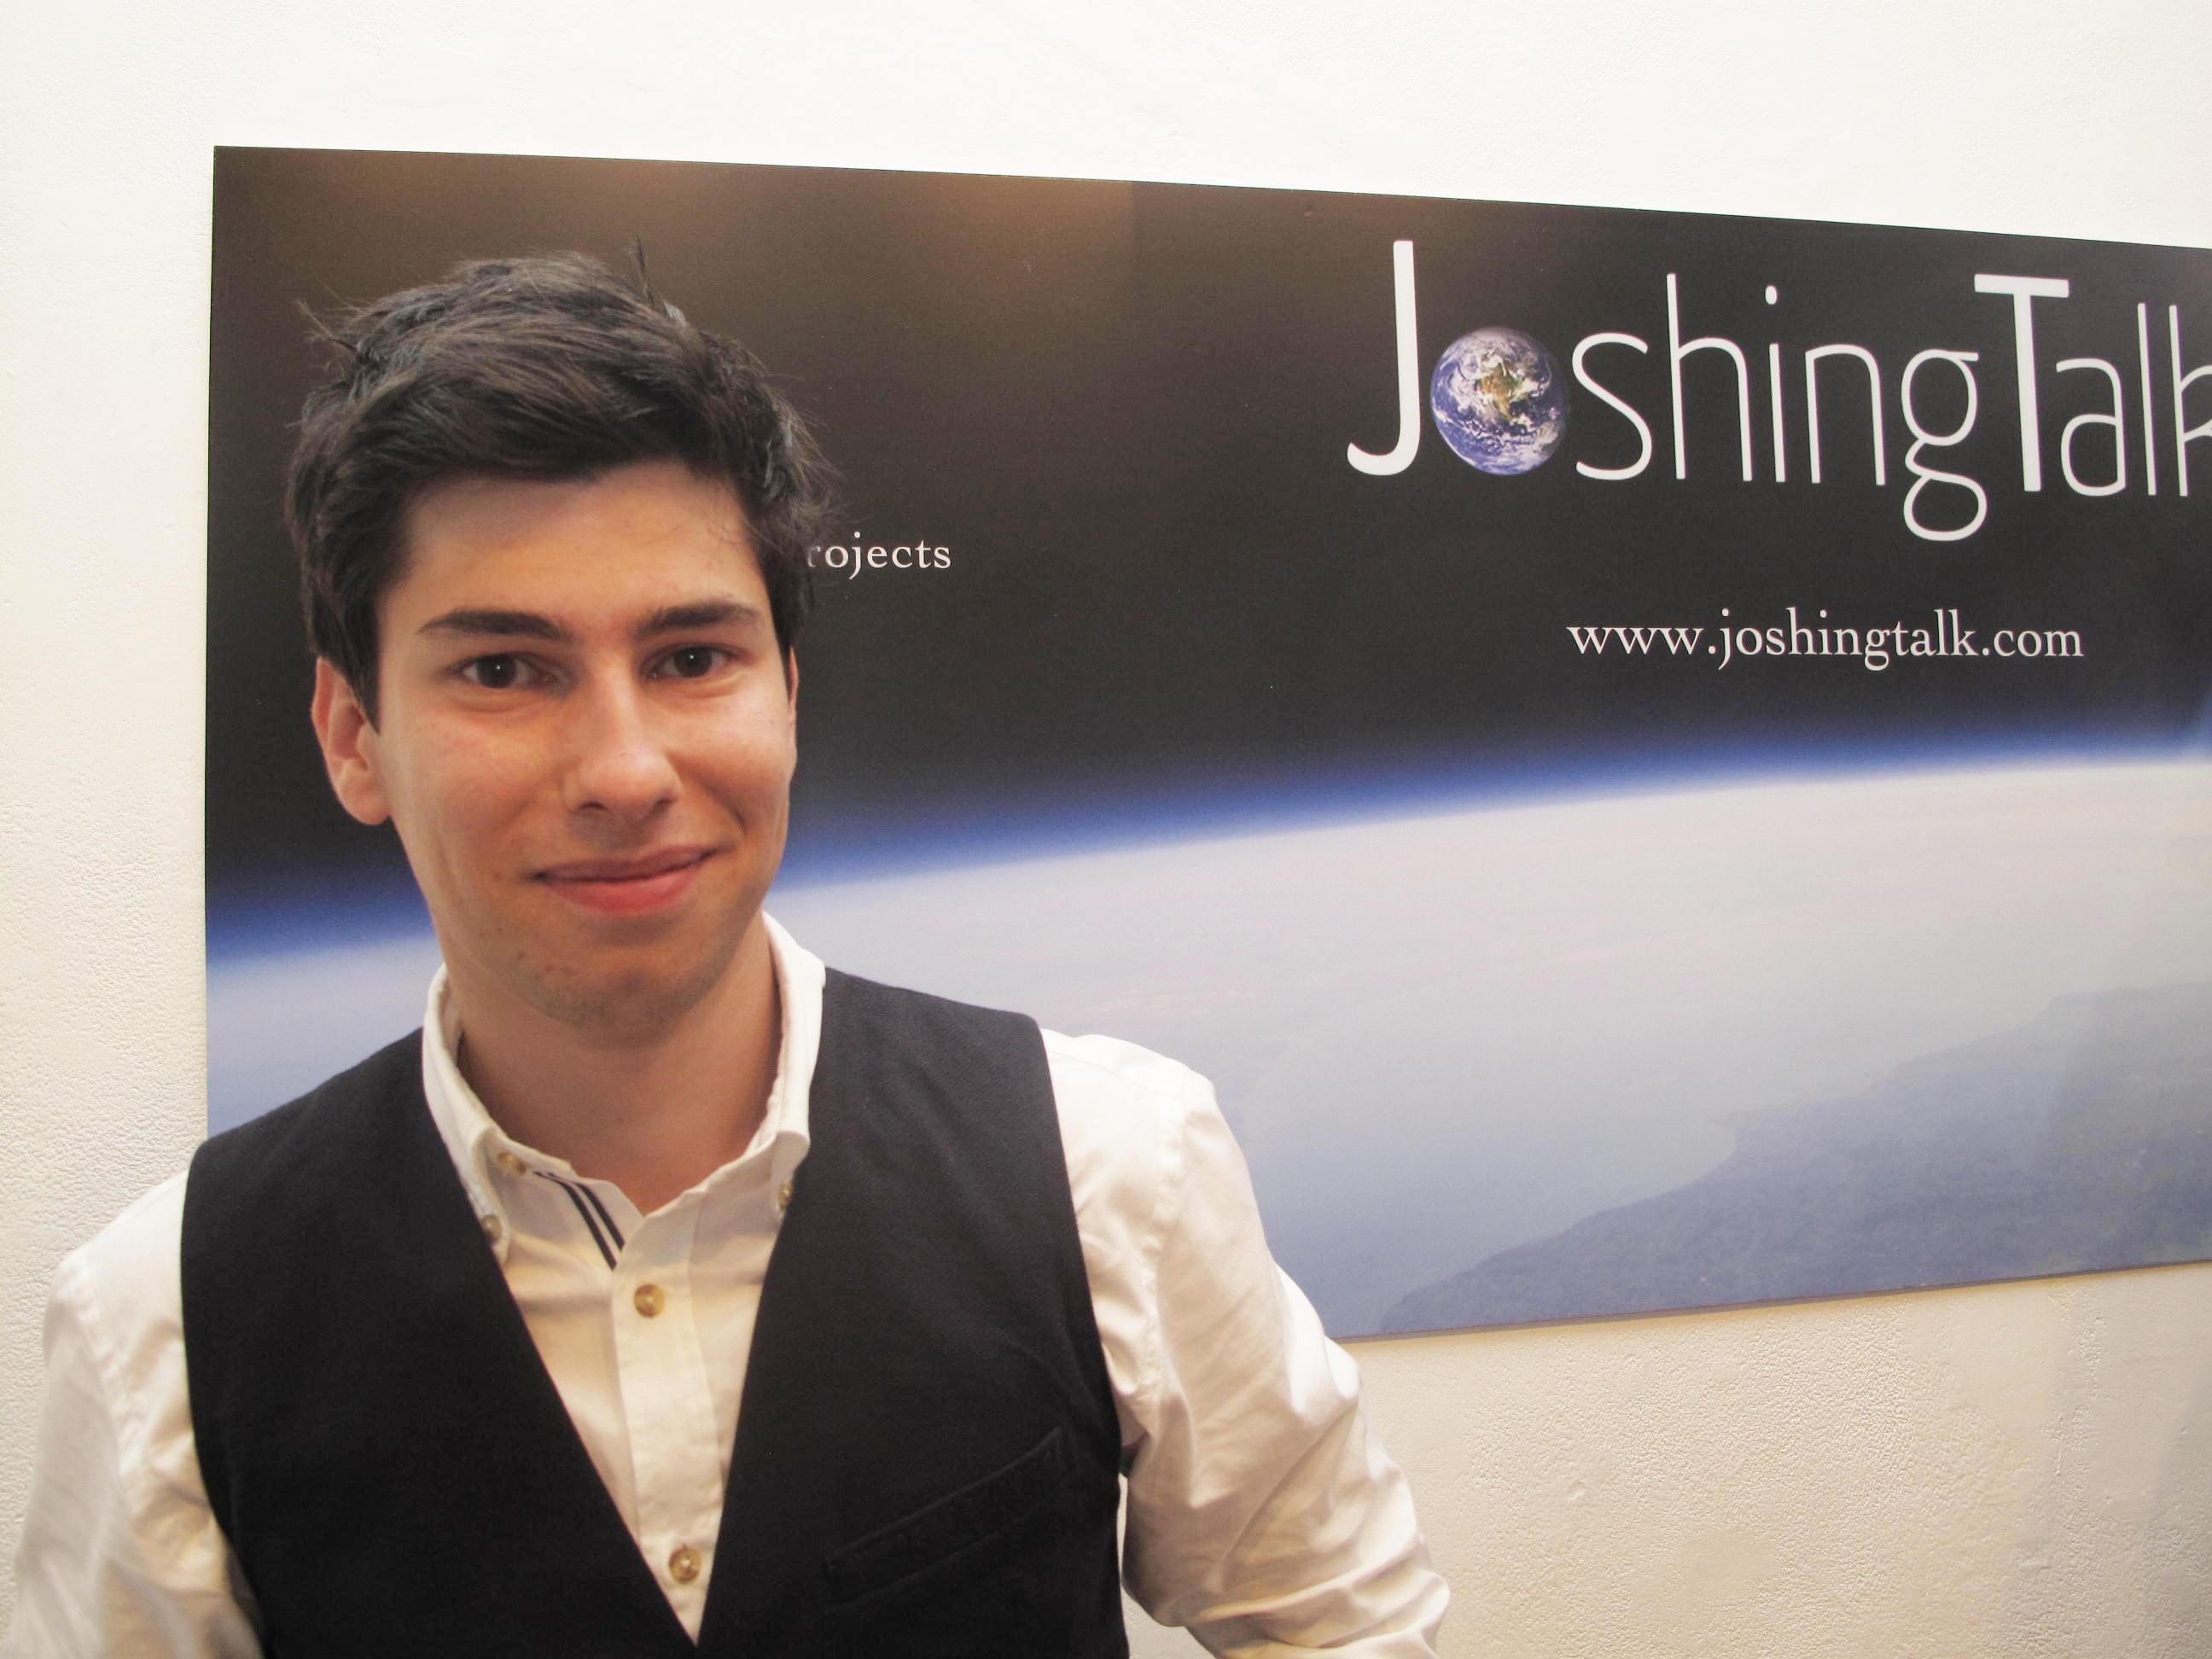 Josh Taylor Launch 033